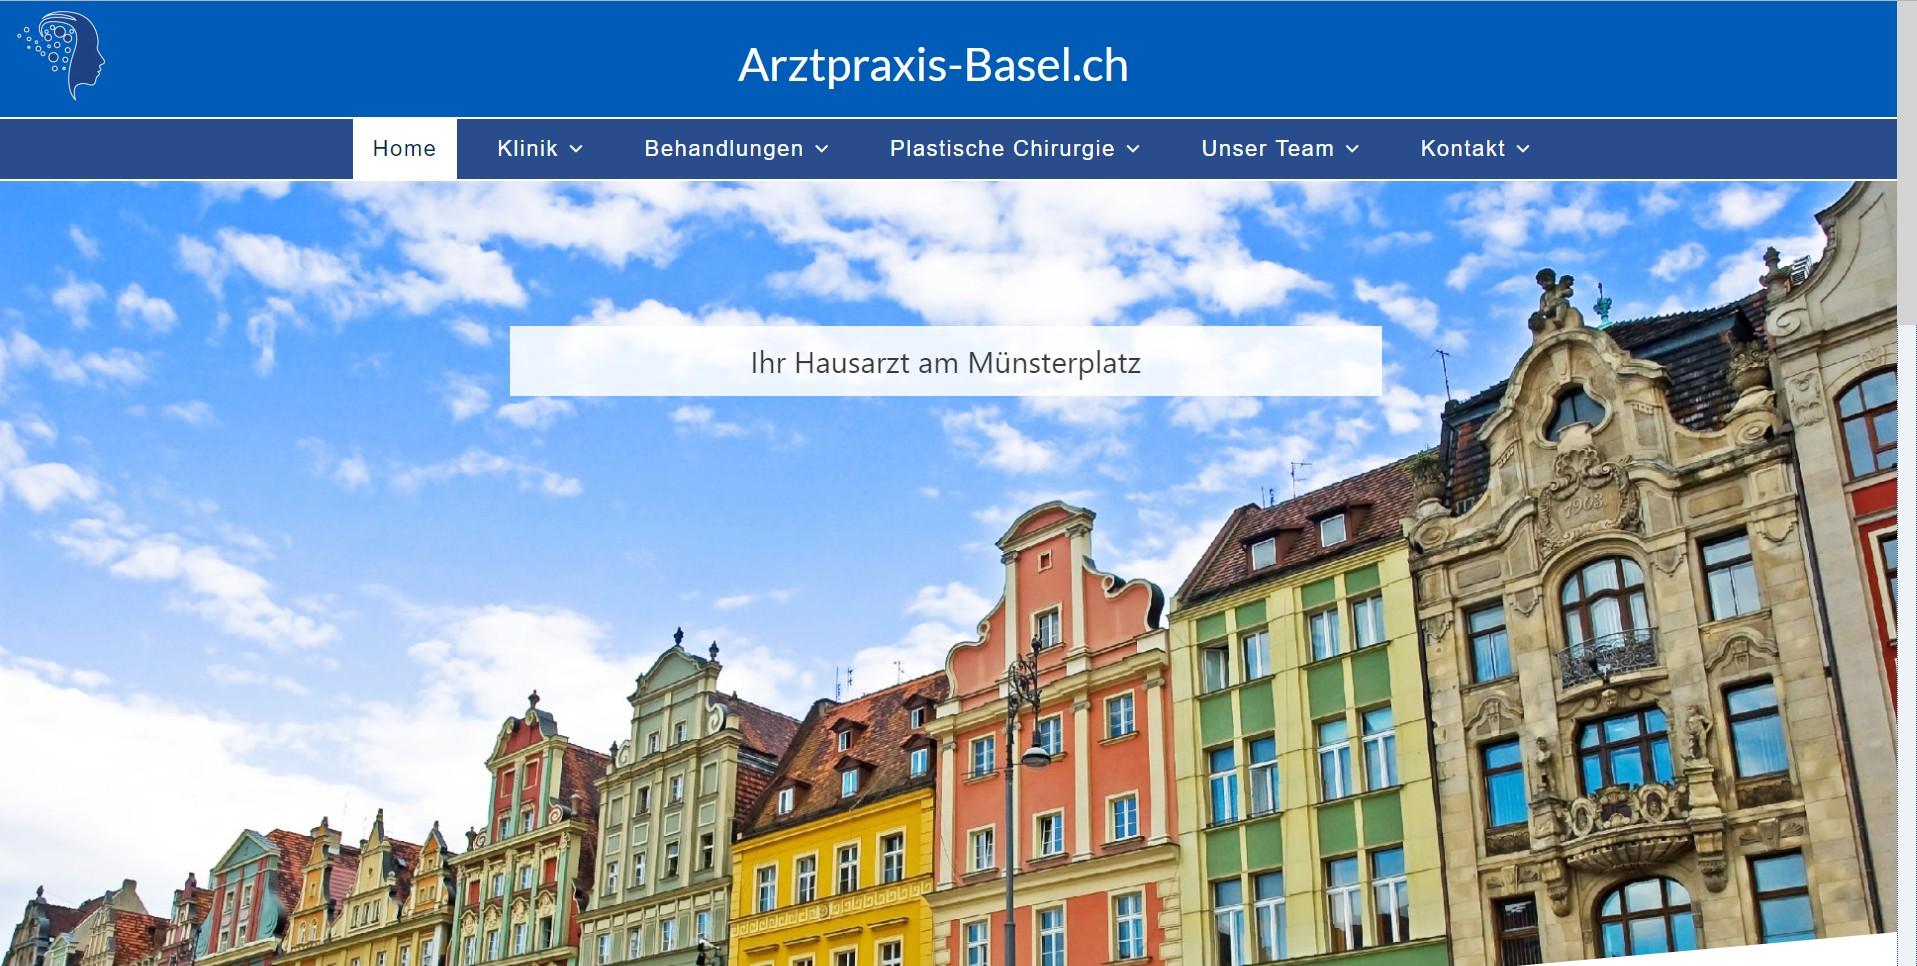 Arztpraxis-Basel.ch